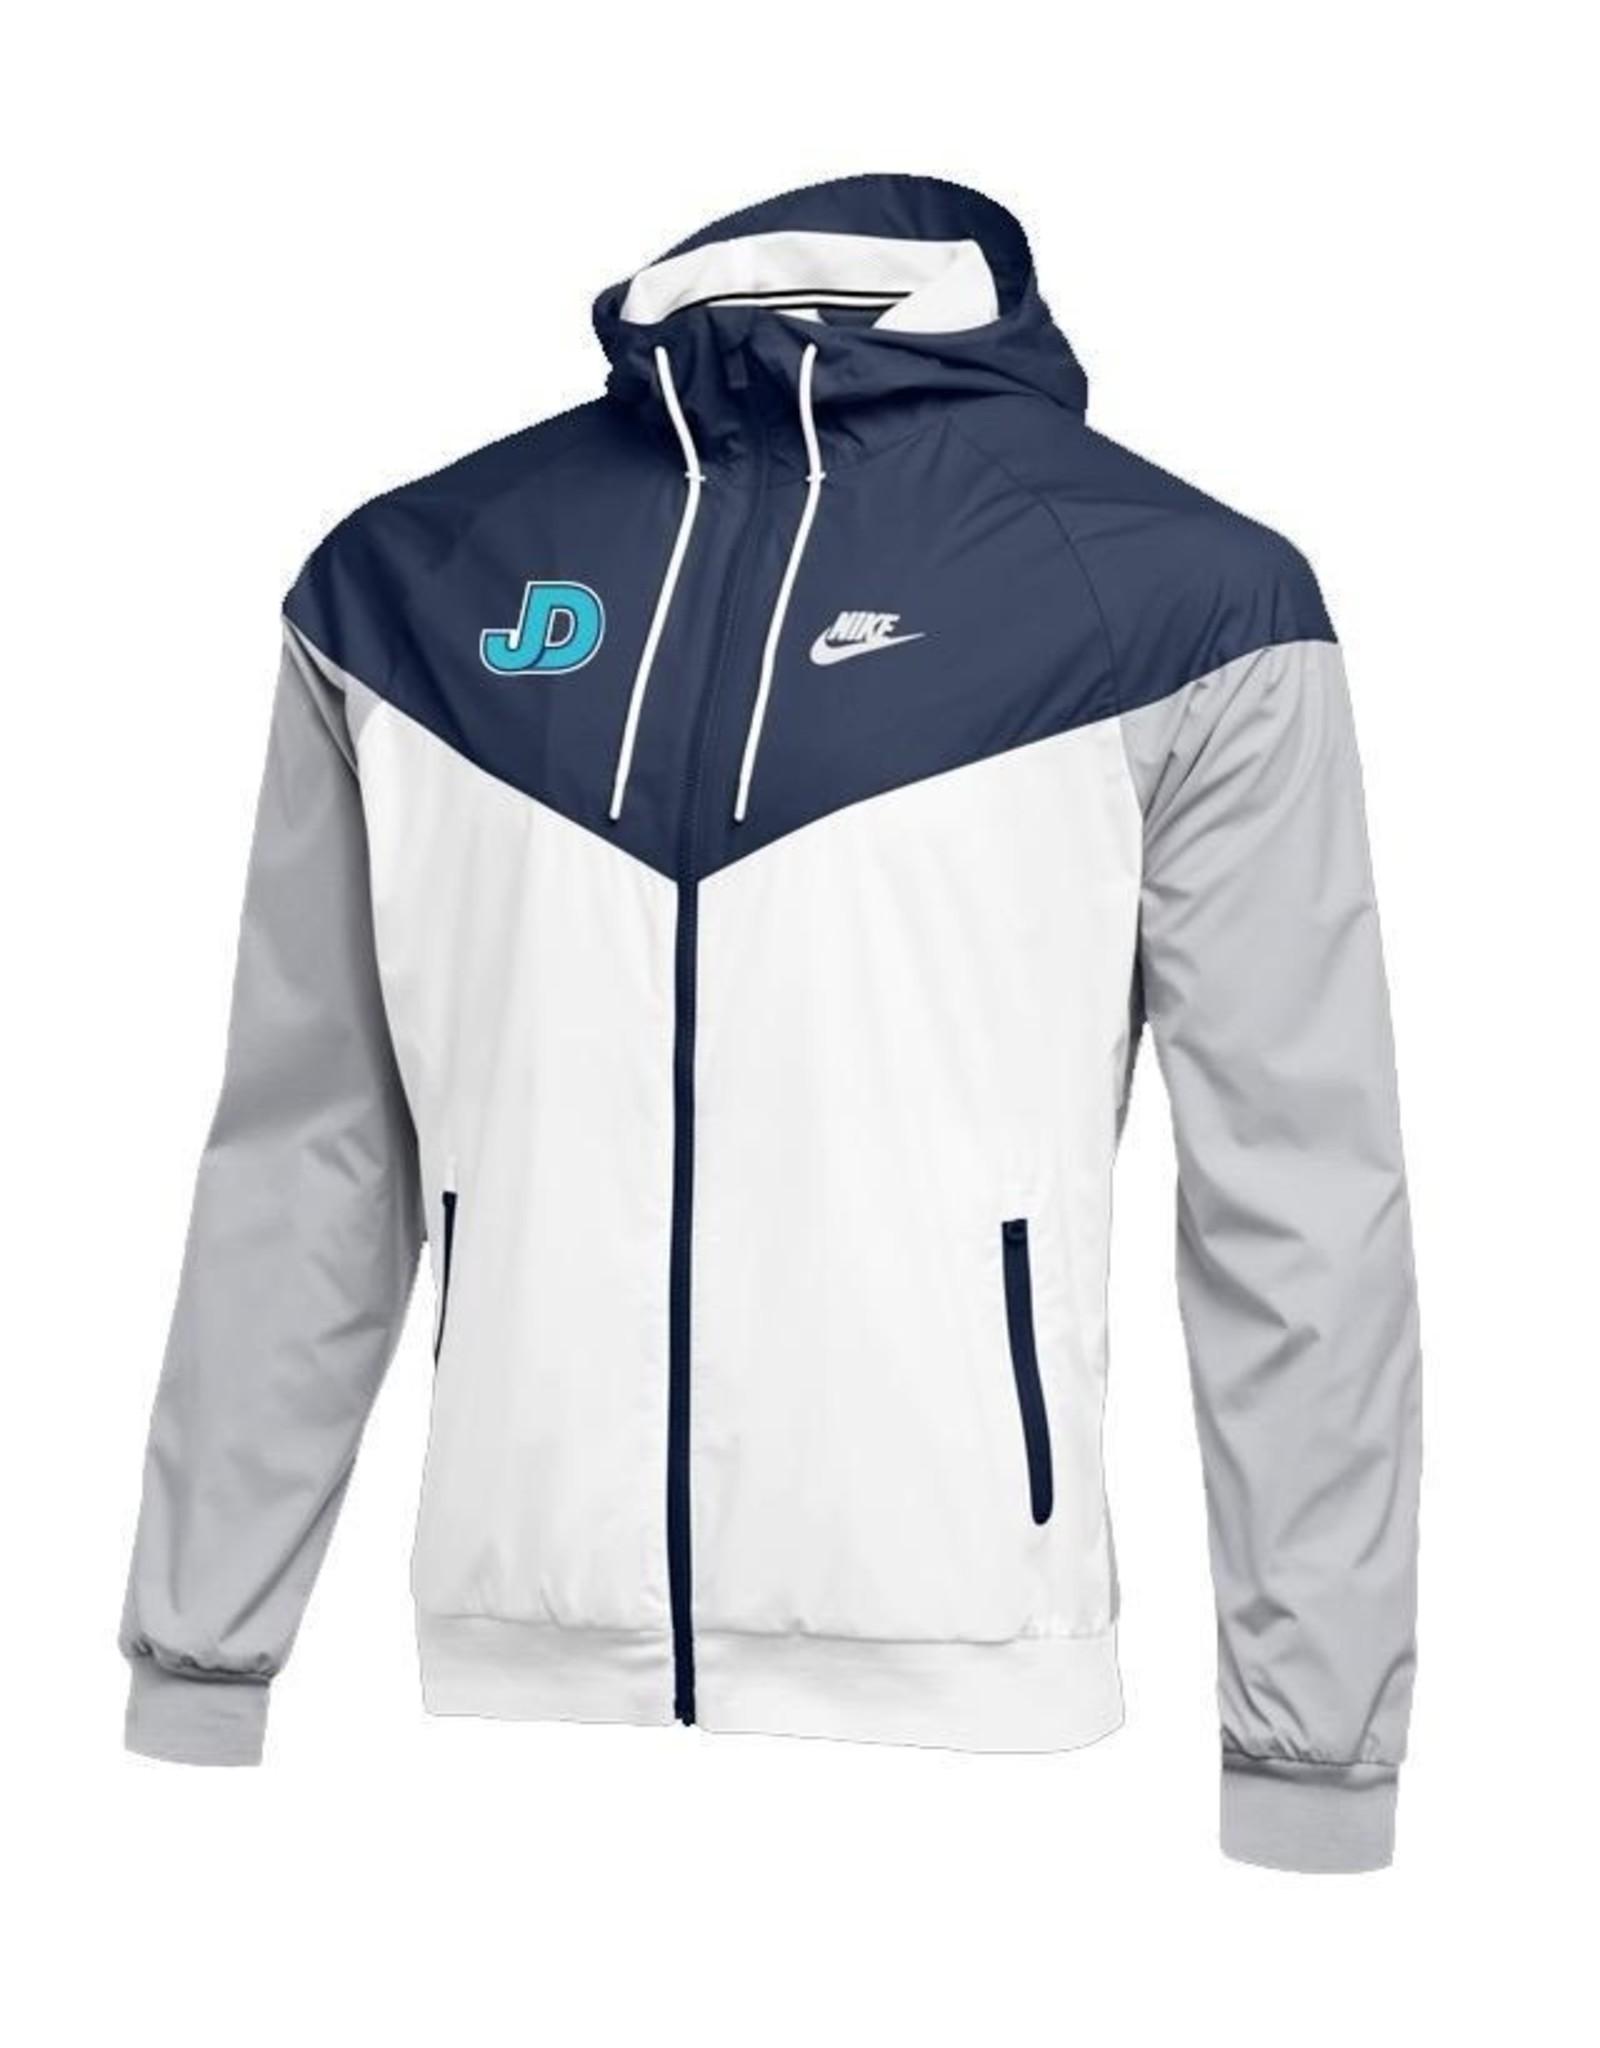 NON-UNIFORM JD Windrunner Jacket, Custom Baseball, navy